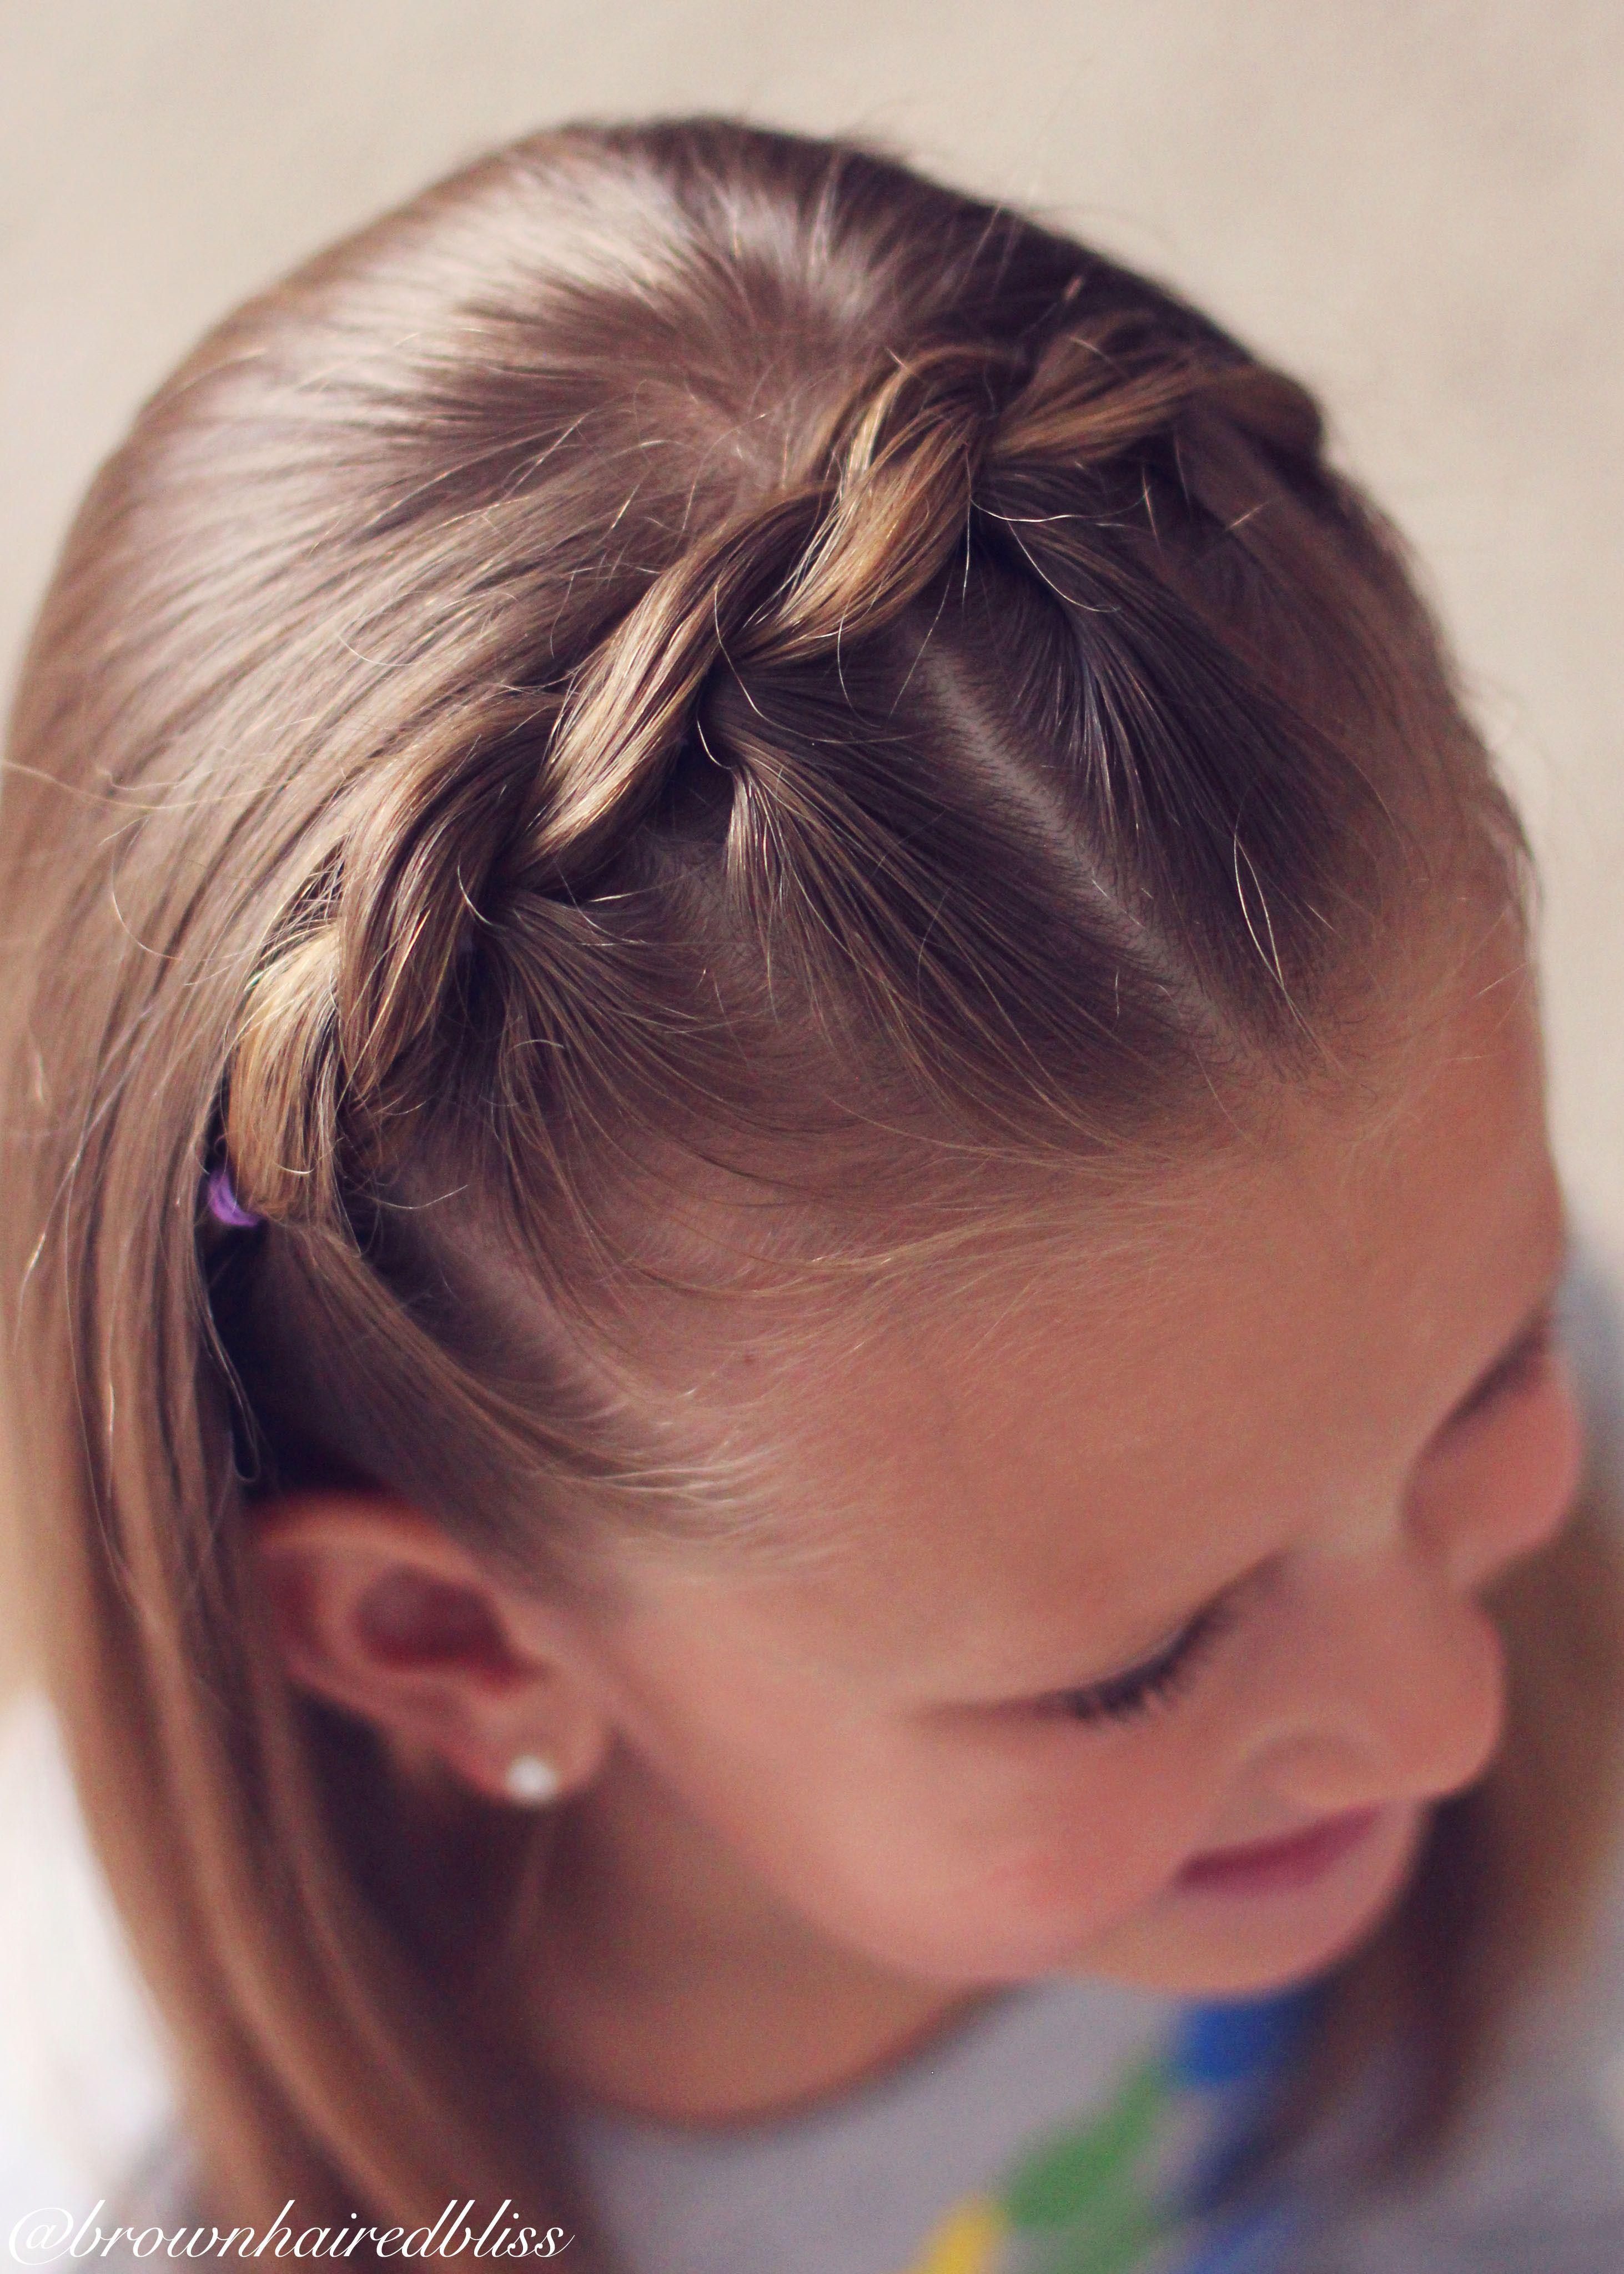 040815 Hair Styles Braided Hairstyles Hair